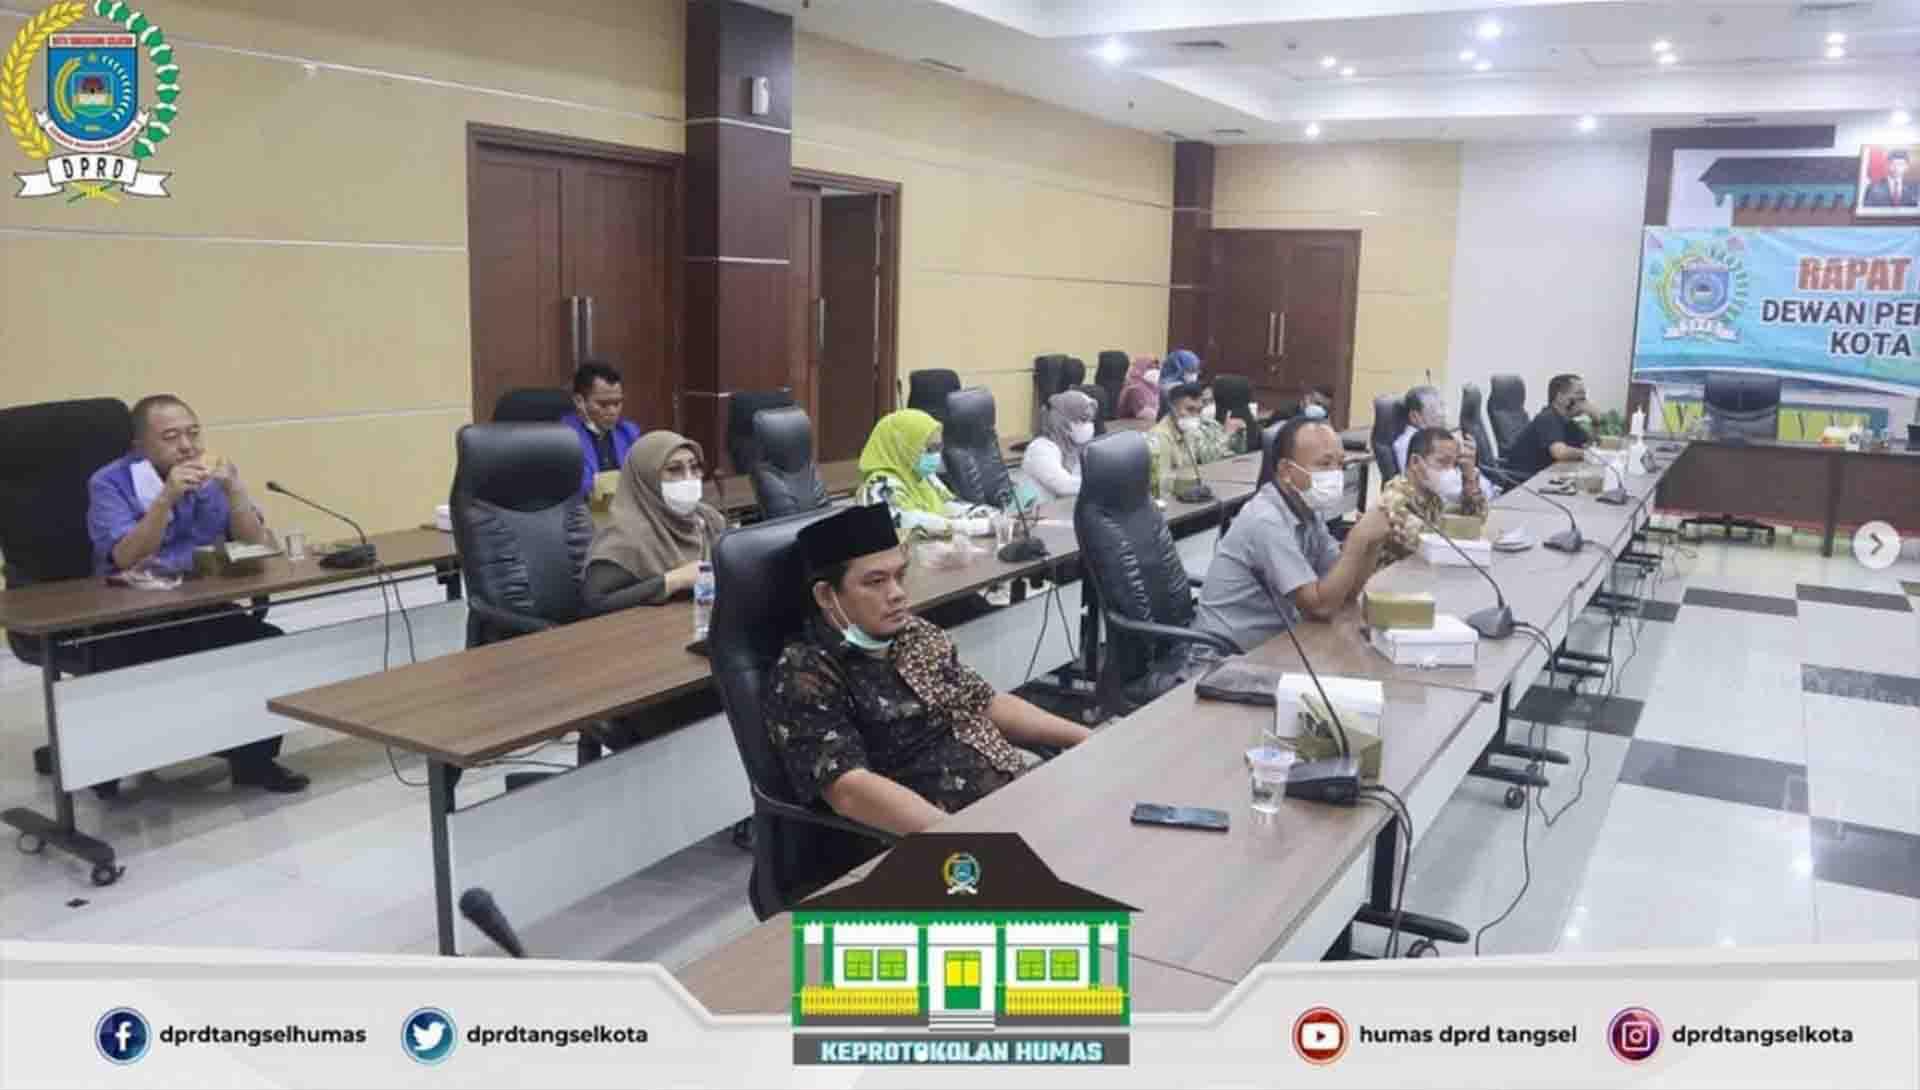 Rapat Badan Musyawarah DPRD Kota Tangerang Selatan